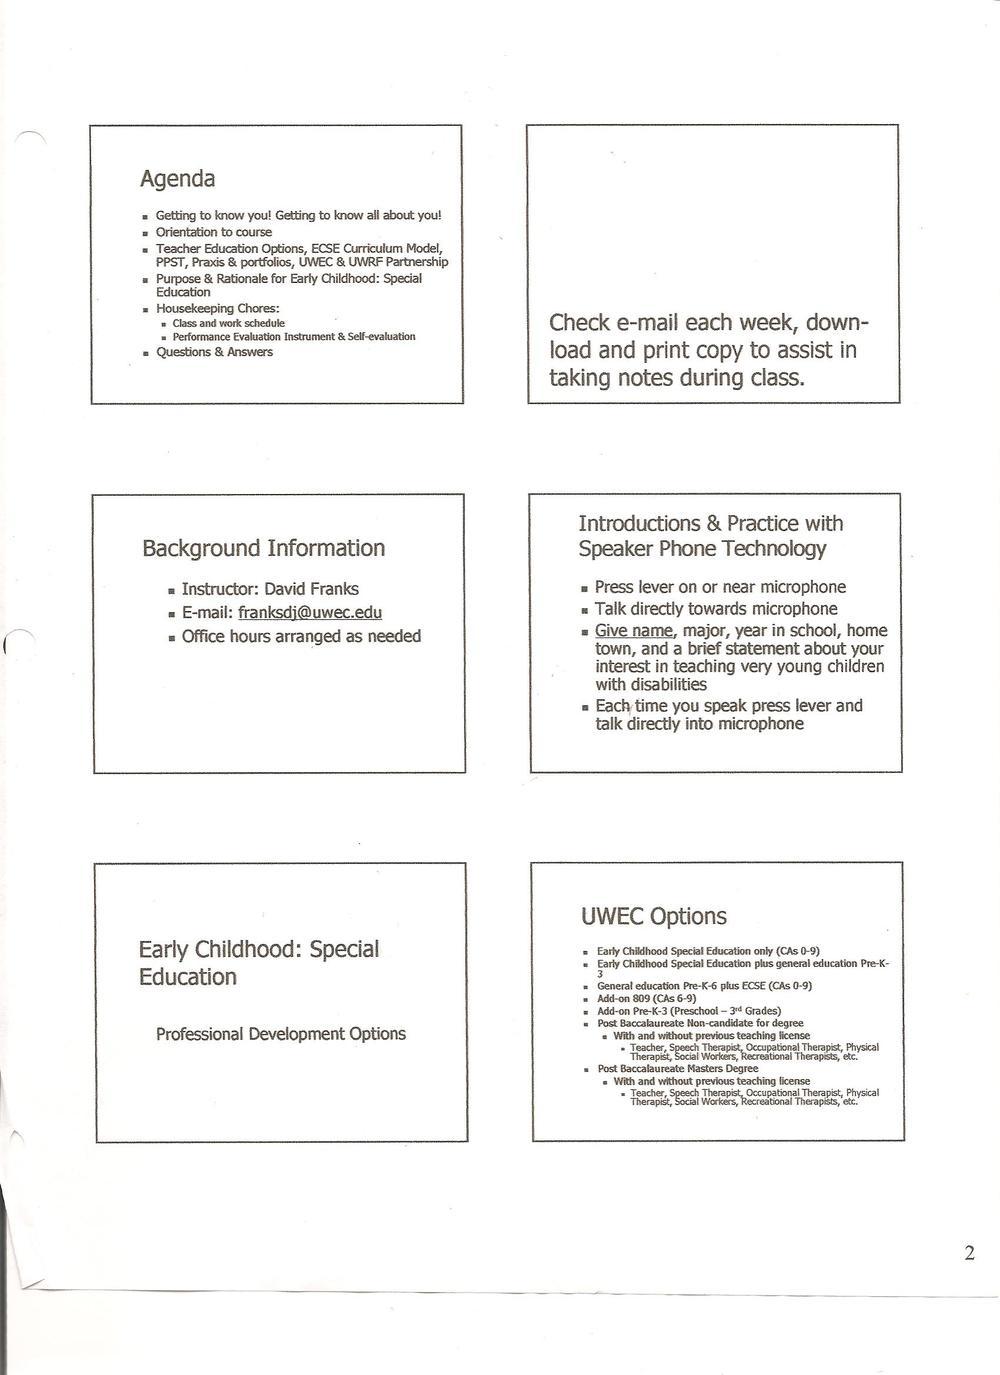 Instructional Presentations A Teacher Educators Notes Early